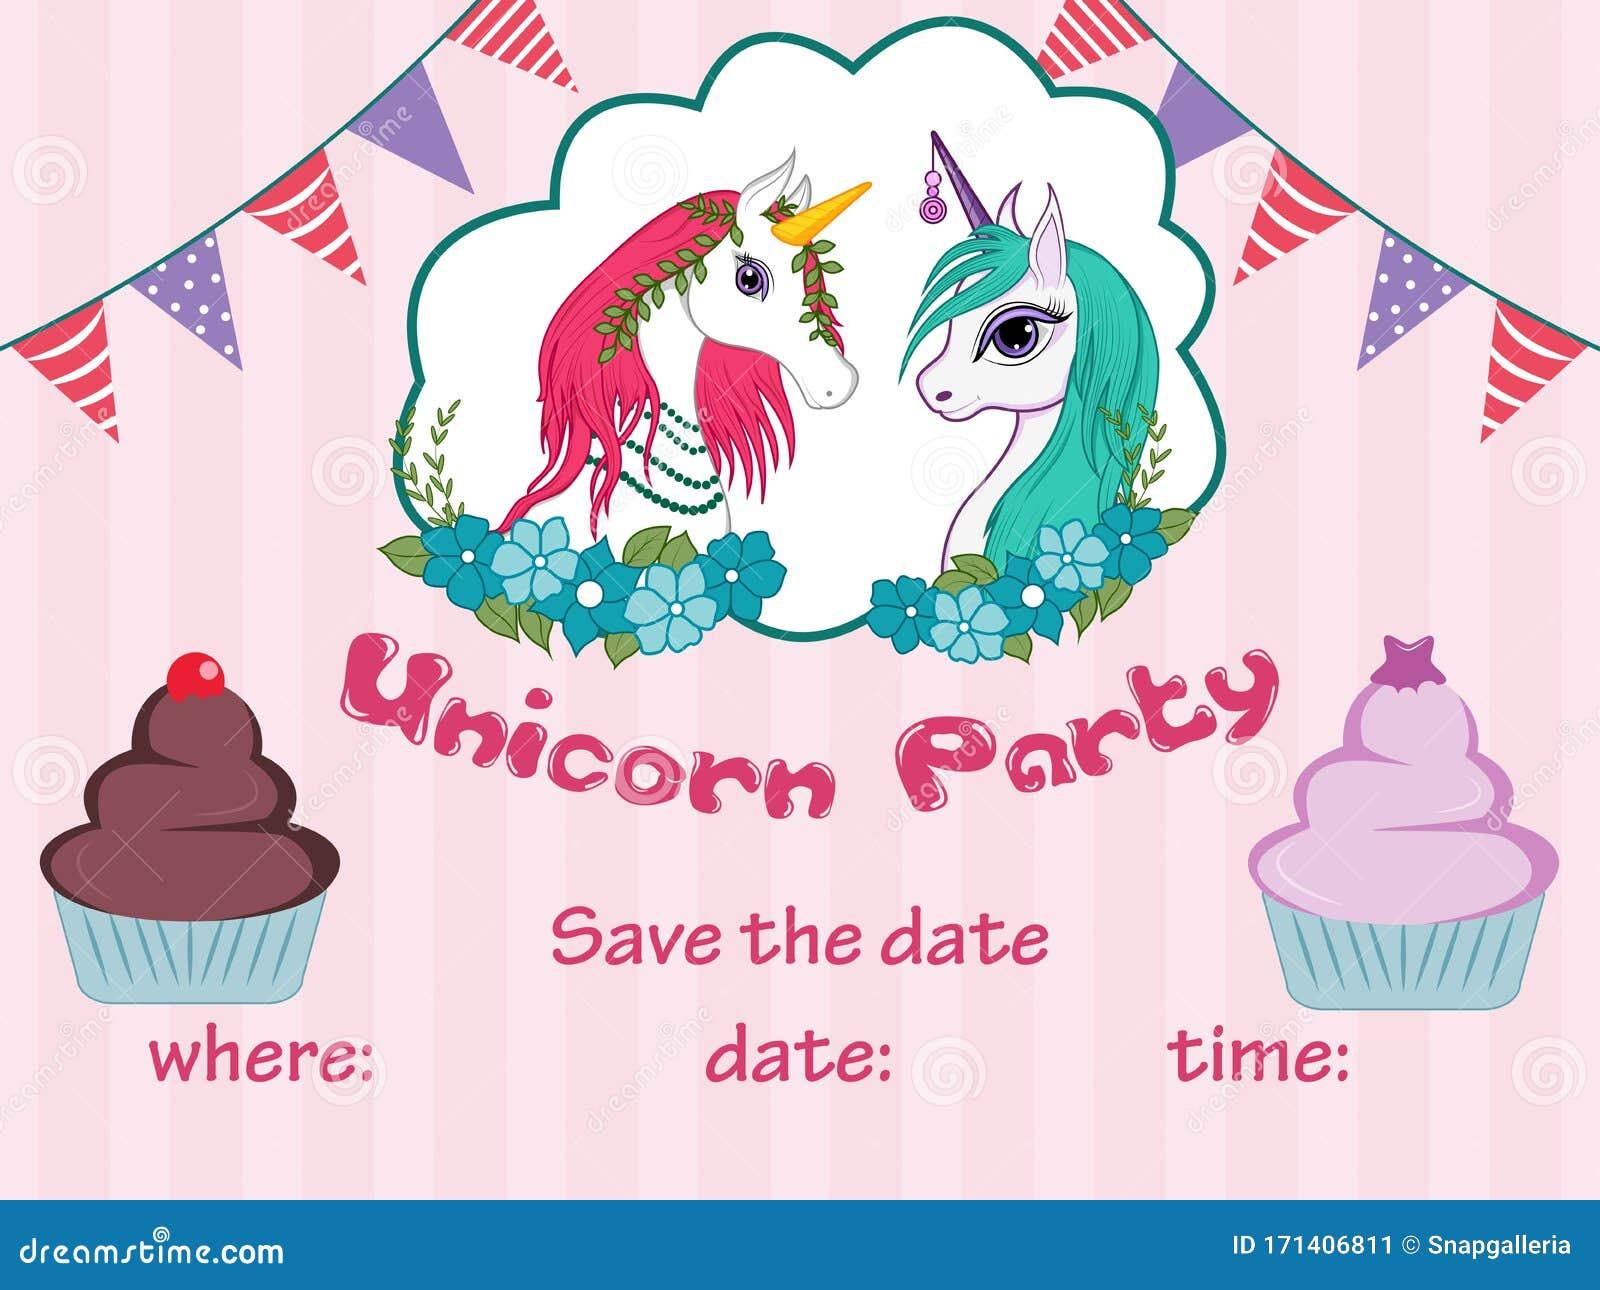 vector illustration of colorful trendy fairy tale unicorn